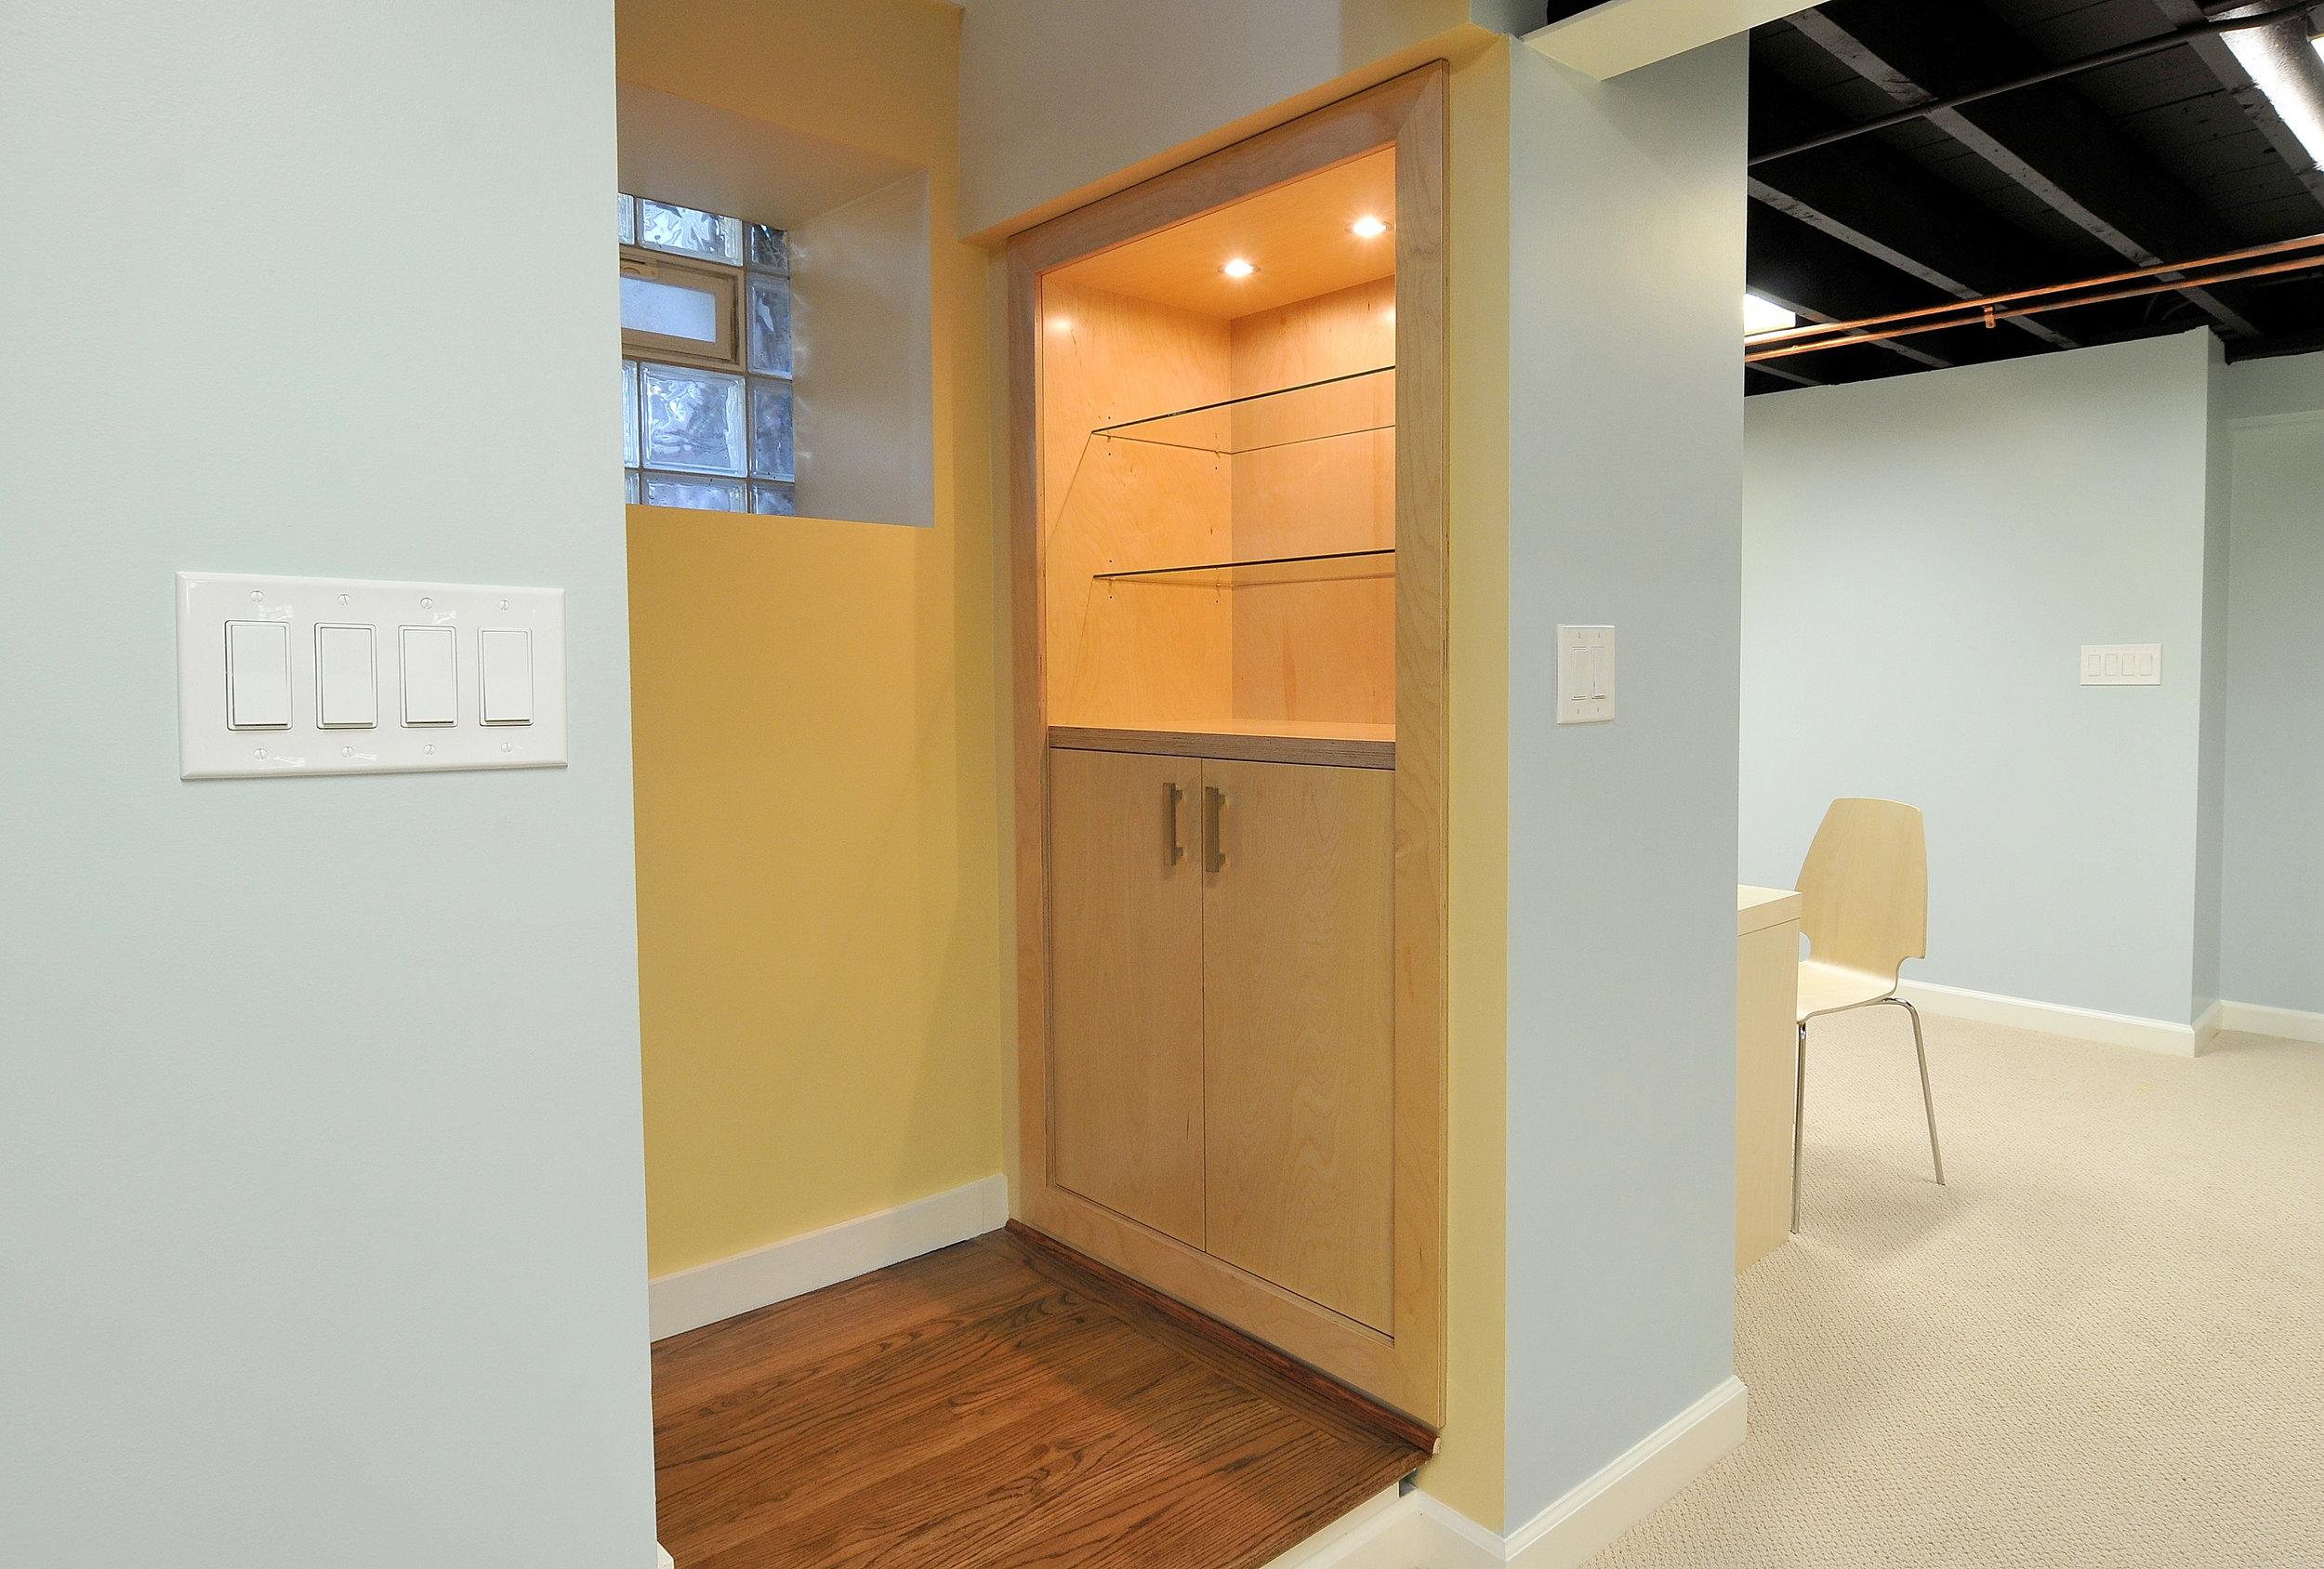 Evanston_Basement_Renovation_Interior_Stair_Millwork.JPG